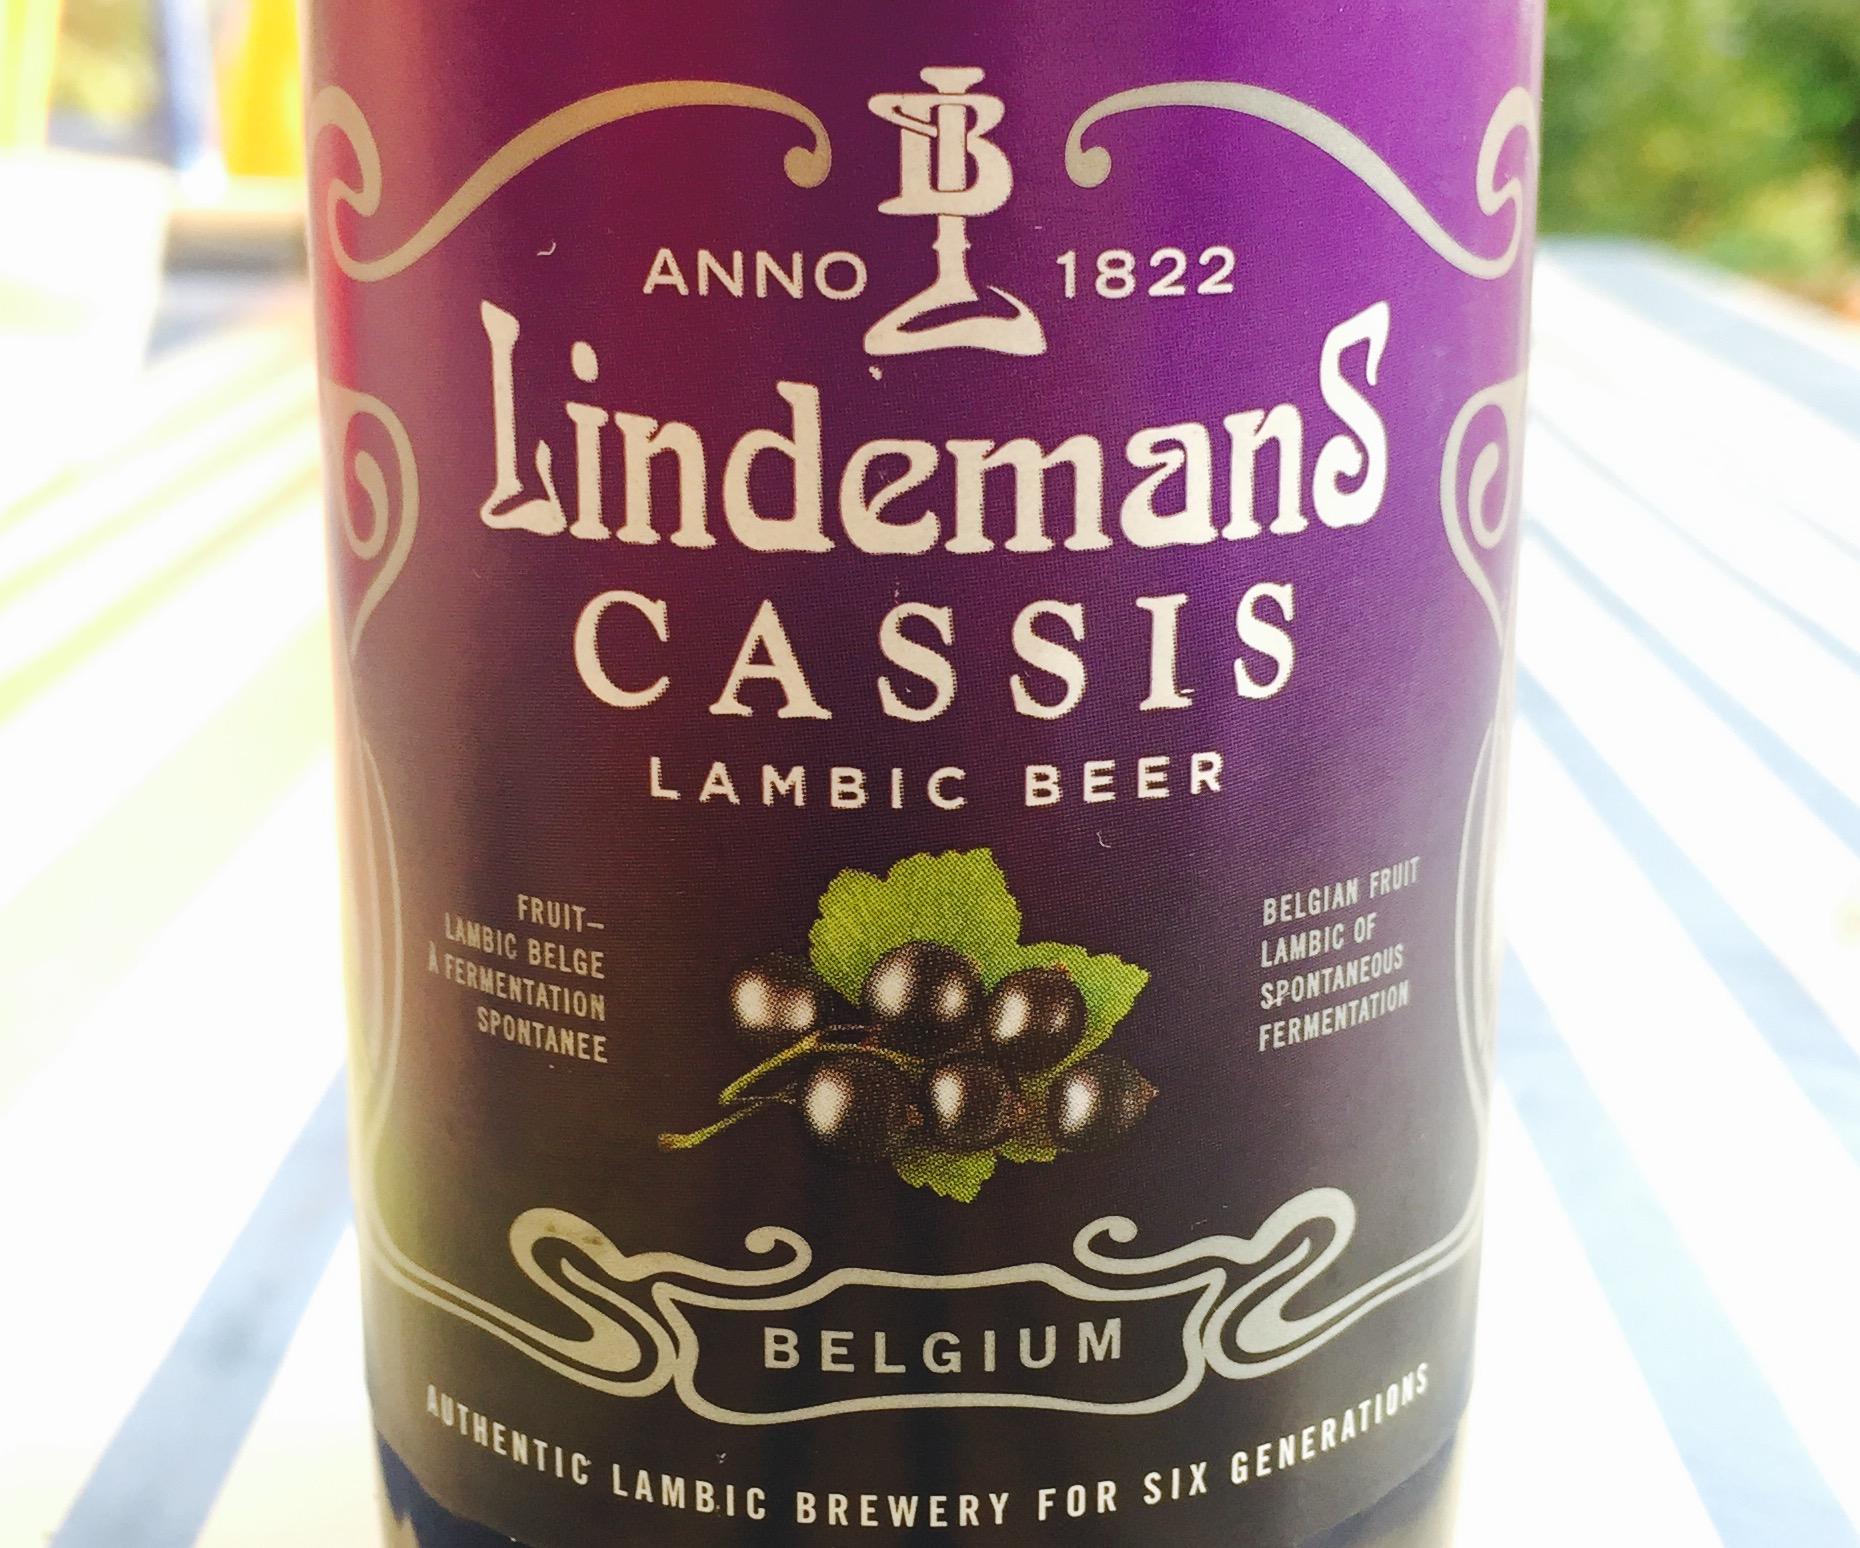 Lindemans - Cassis Lambic Beer